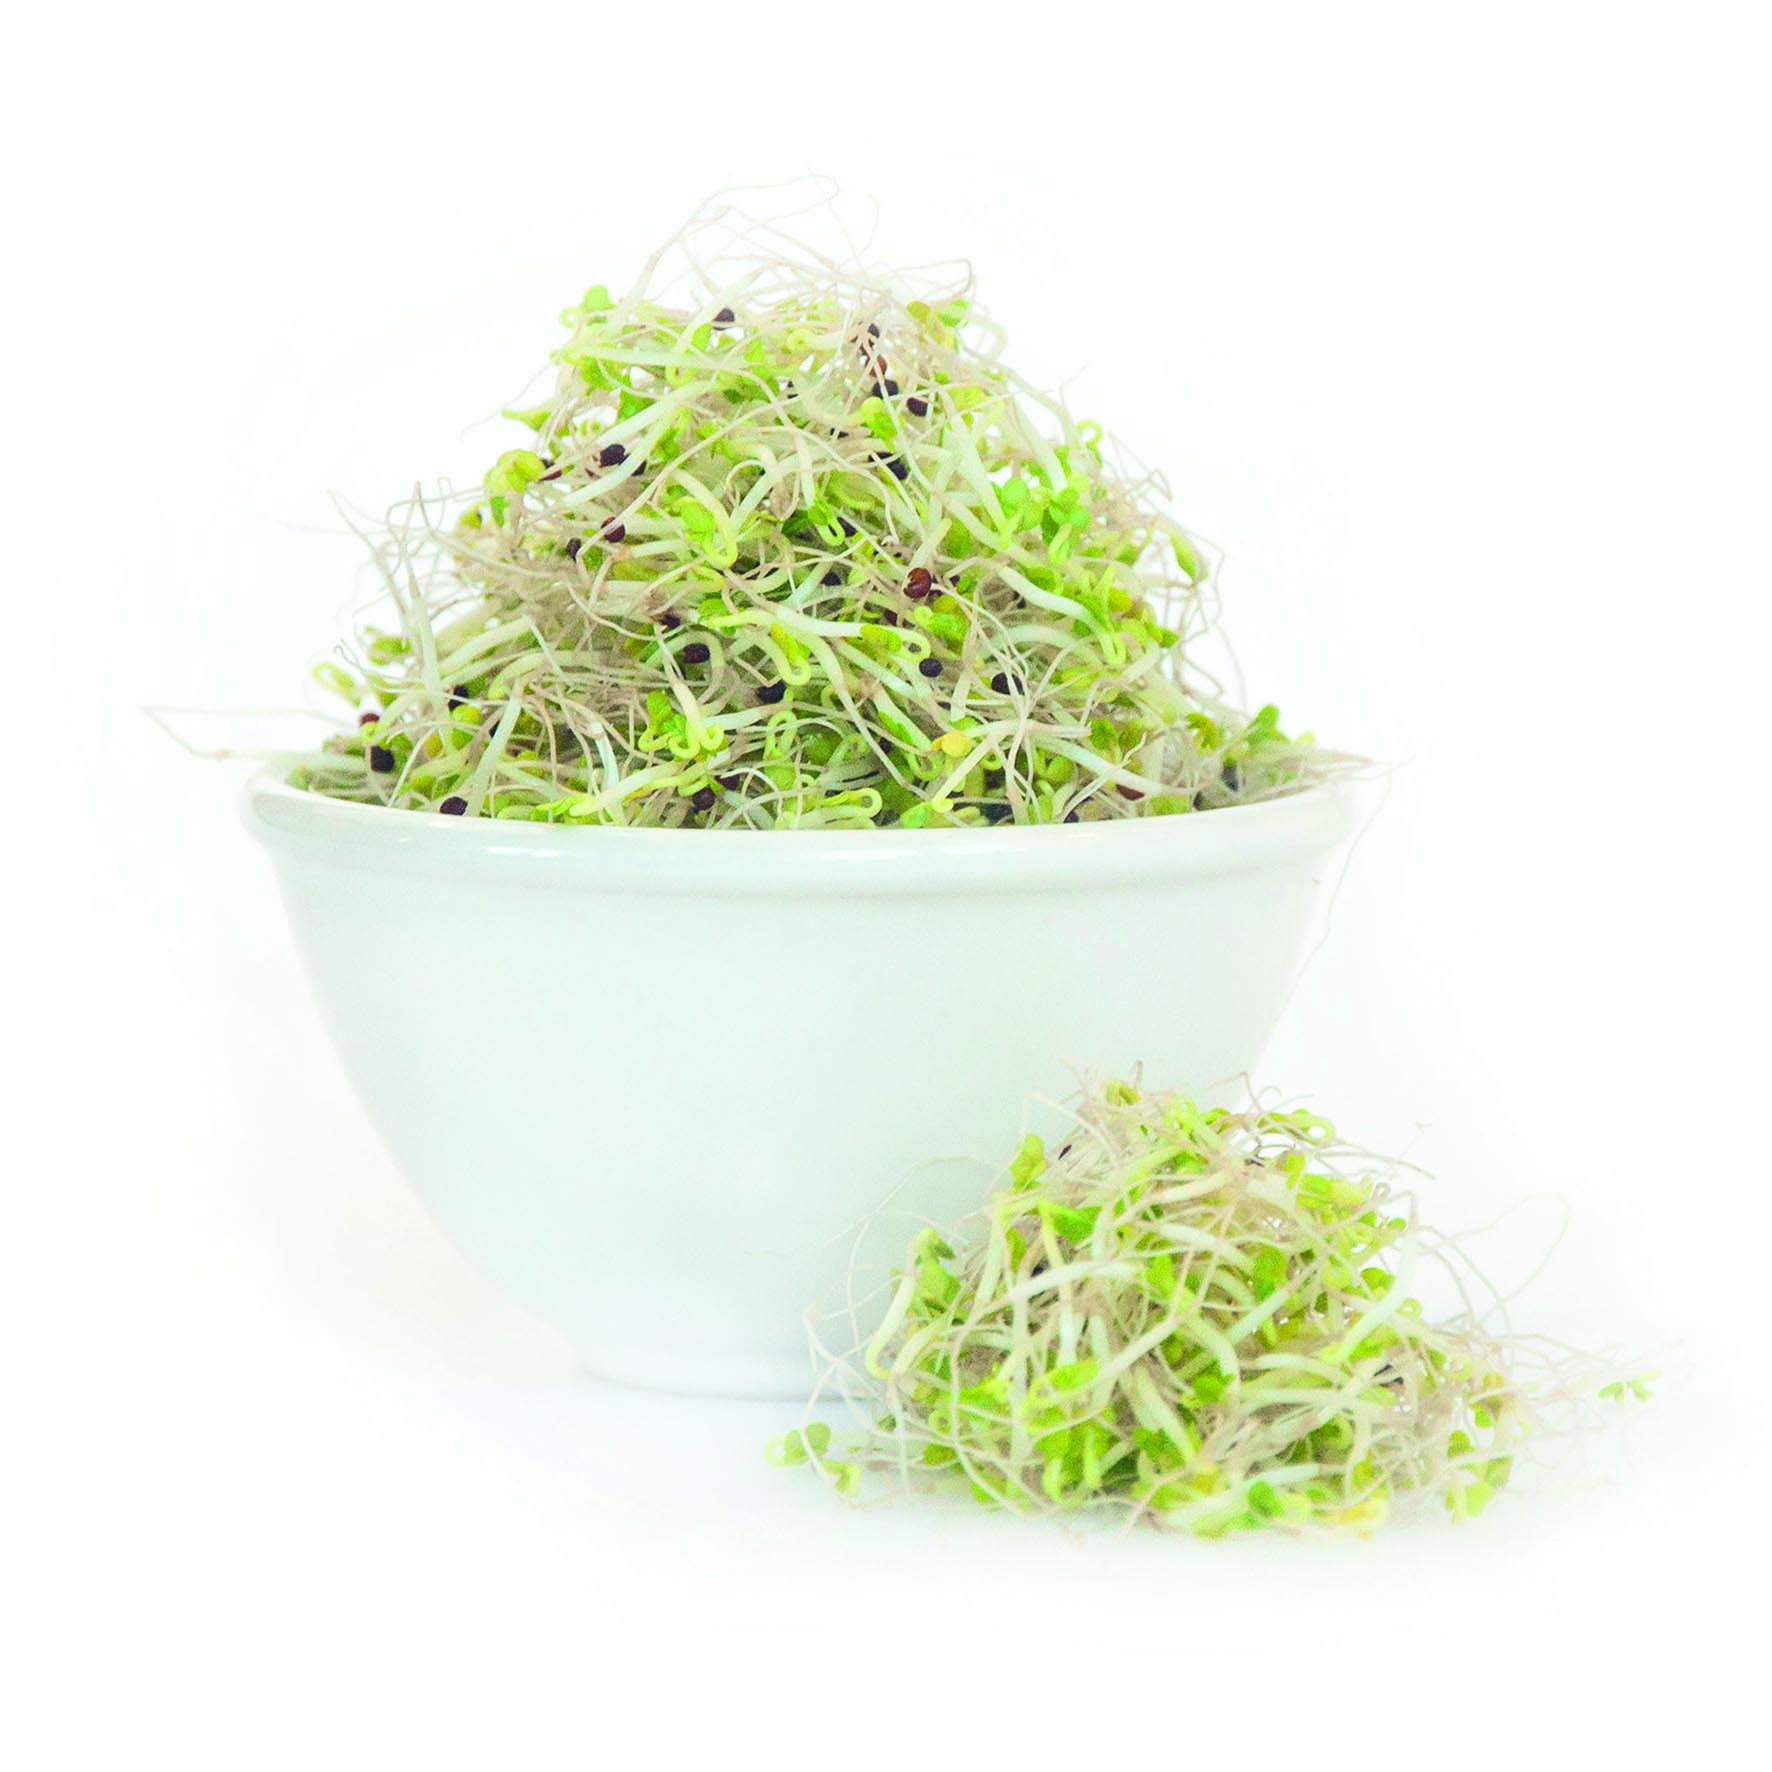 broccoligroddar